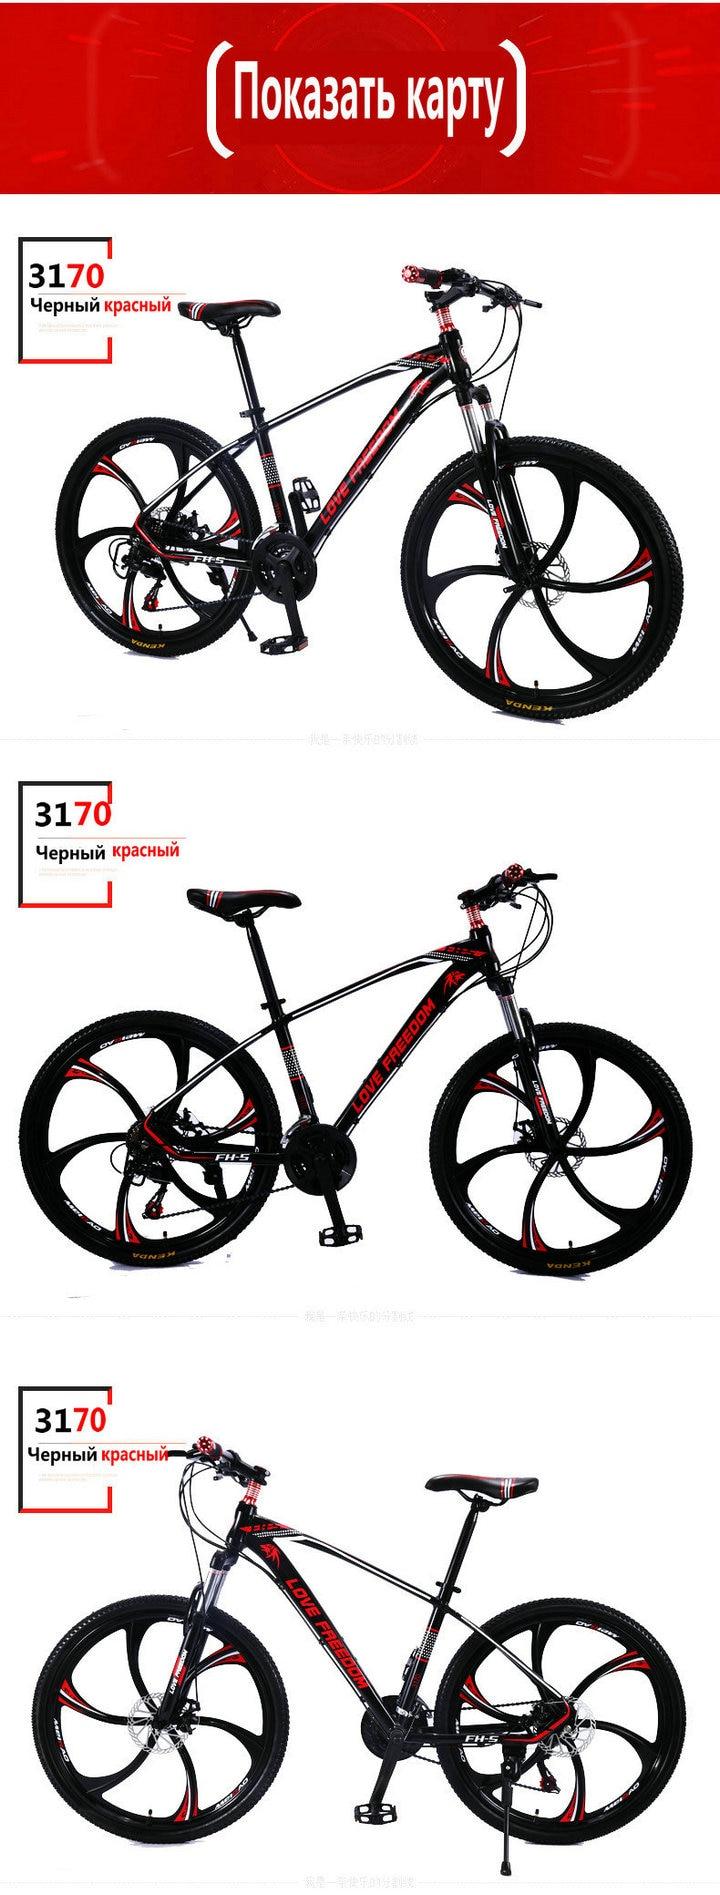 HTB1zTiMa8Gw3KVjSZFwq6zQ2FXa1 Love Freedom 21 speed 26 inch mountain bike bicycles double disc brakes student bike Bicicleta road bike Free Delivery